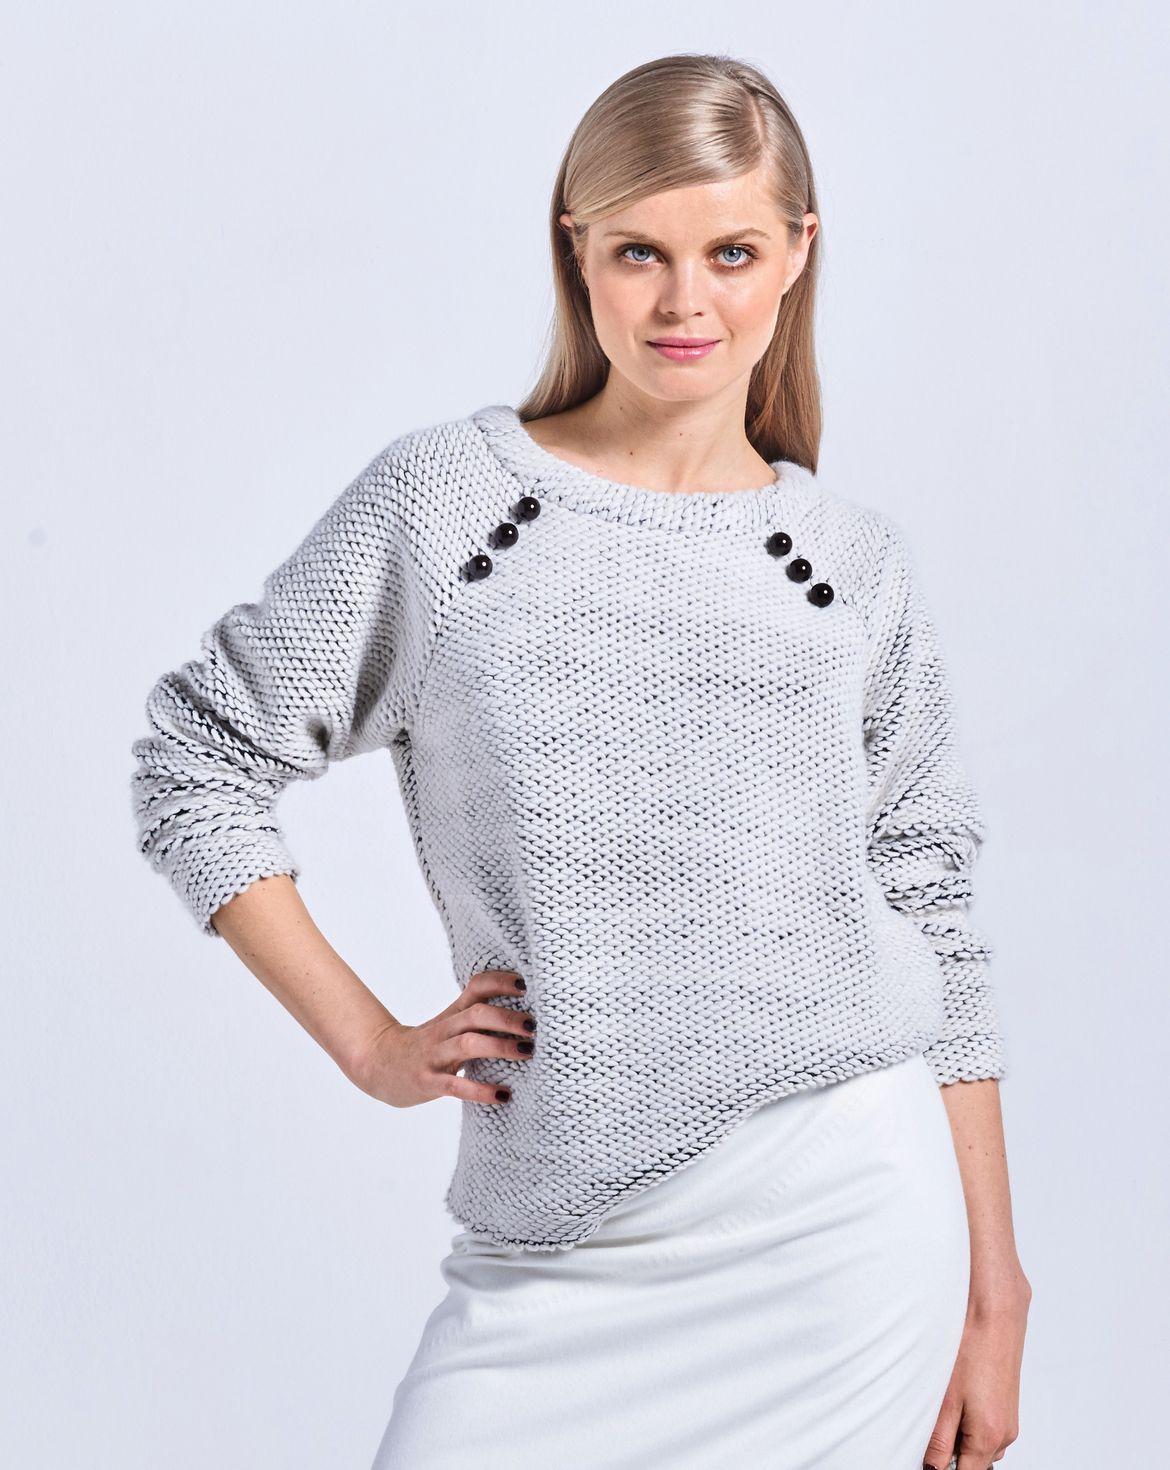 burda style, Schnittmuster, Sweater 10/2016 #114B, In Sachen ...